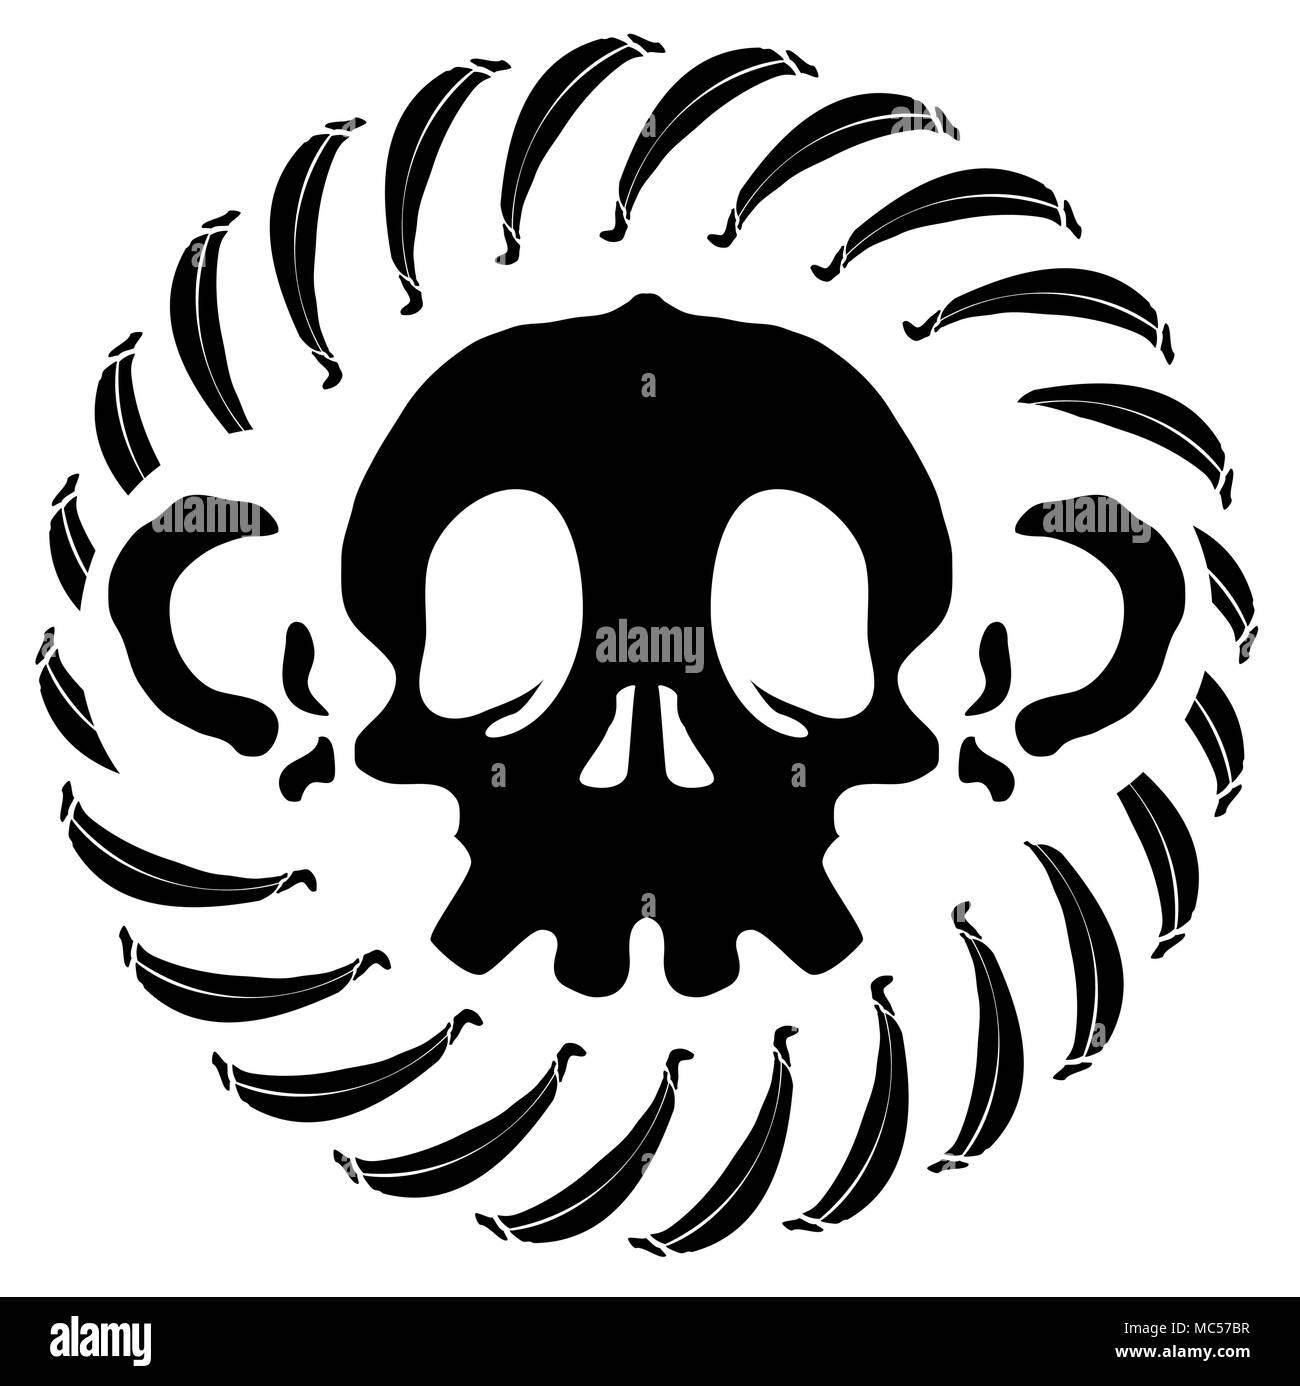 Monkey skull stylized stencil black, vector illustration, isolated - Stock Image